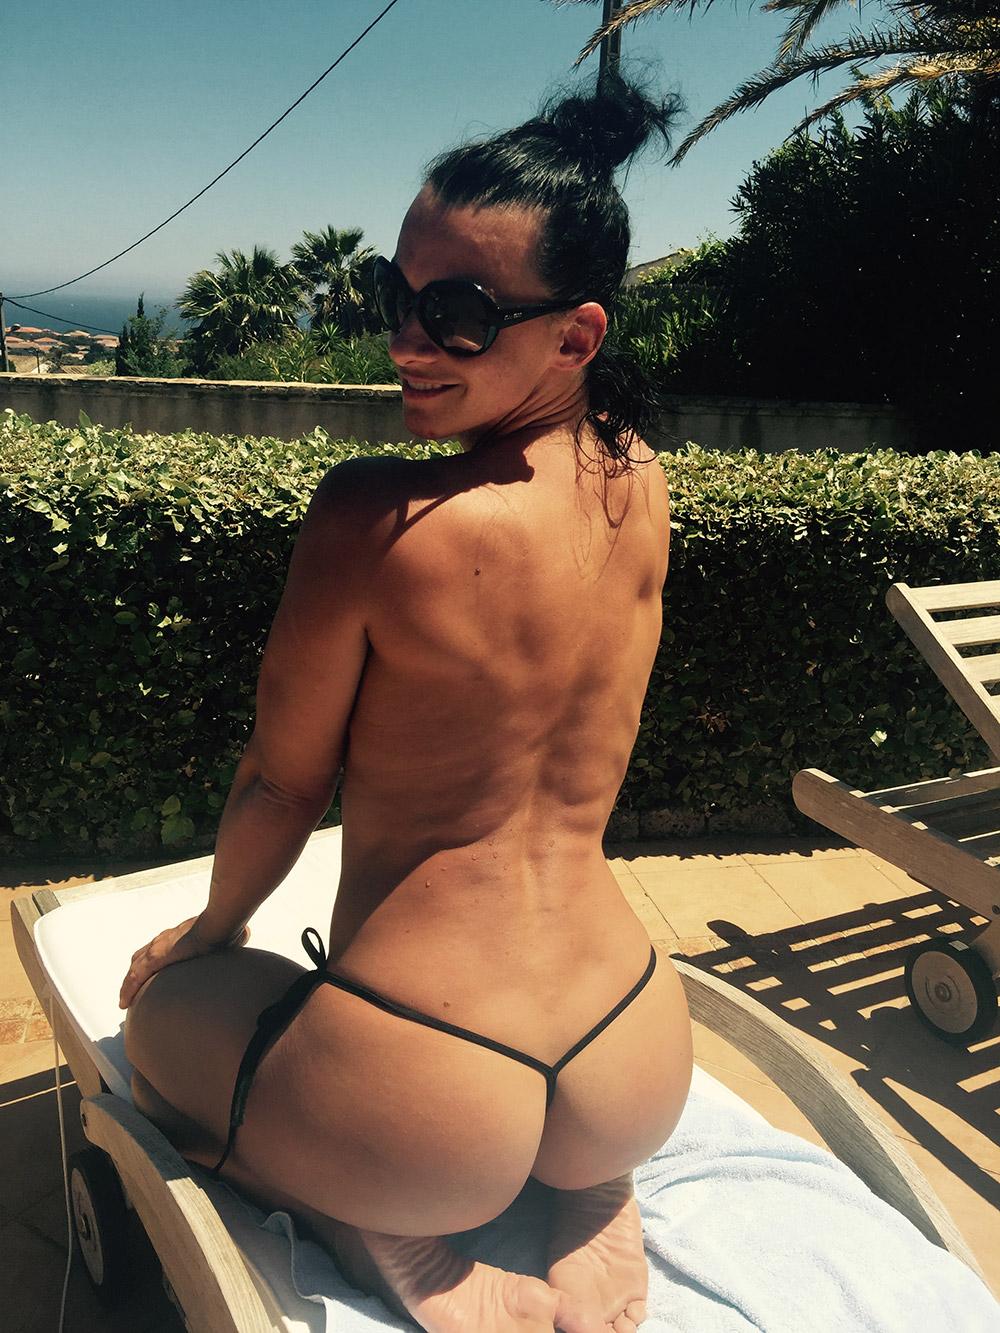 Travelling to St. Tropez, South of France, Cindy Landolt ...